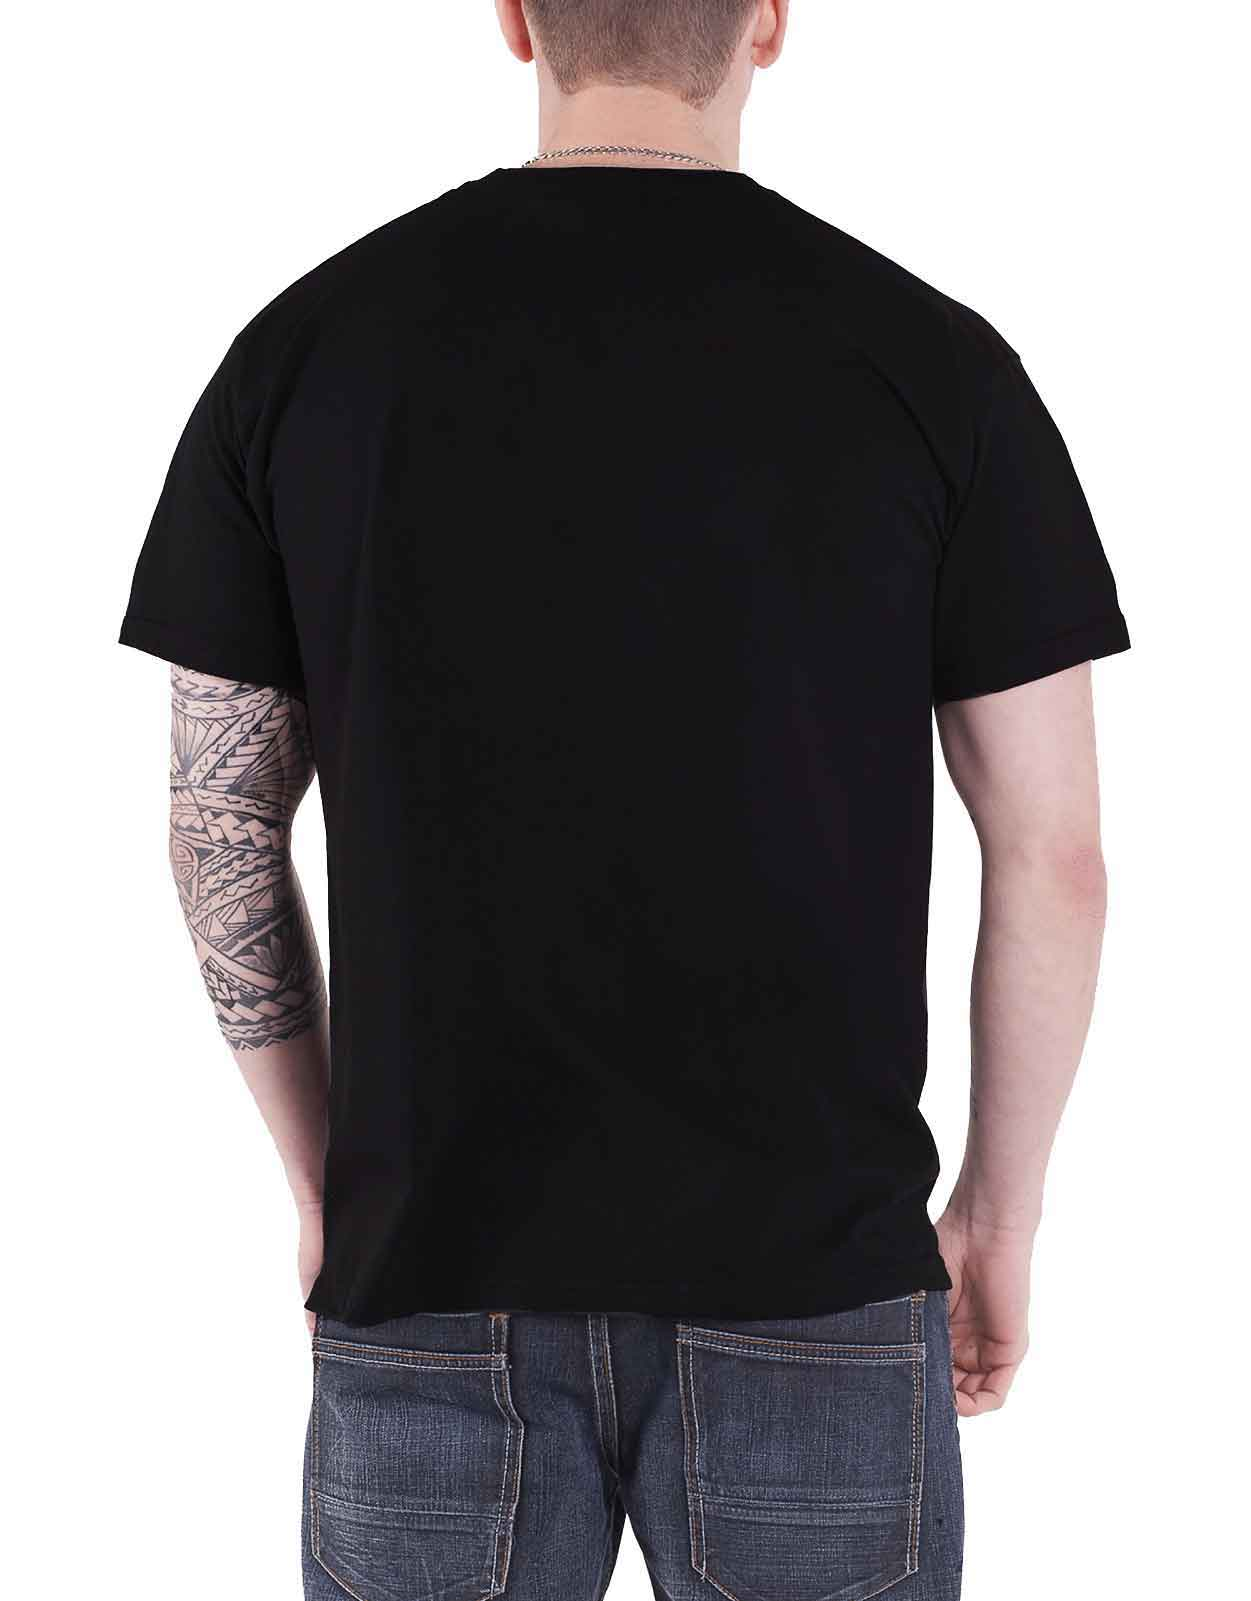 Pelicula-Horror-oficial-Camiseta-Vintage-Movie-Poster-Sci-fi-StudioCanal-Martillo miniatura 5